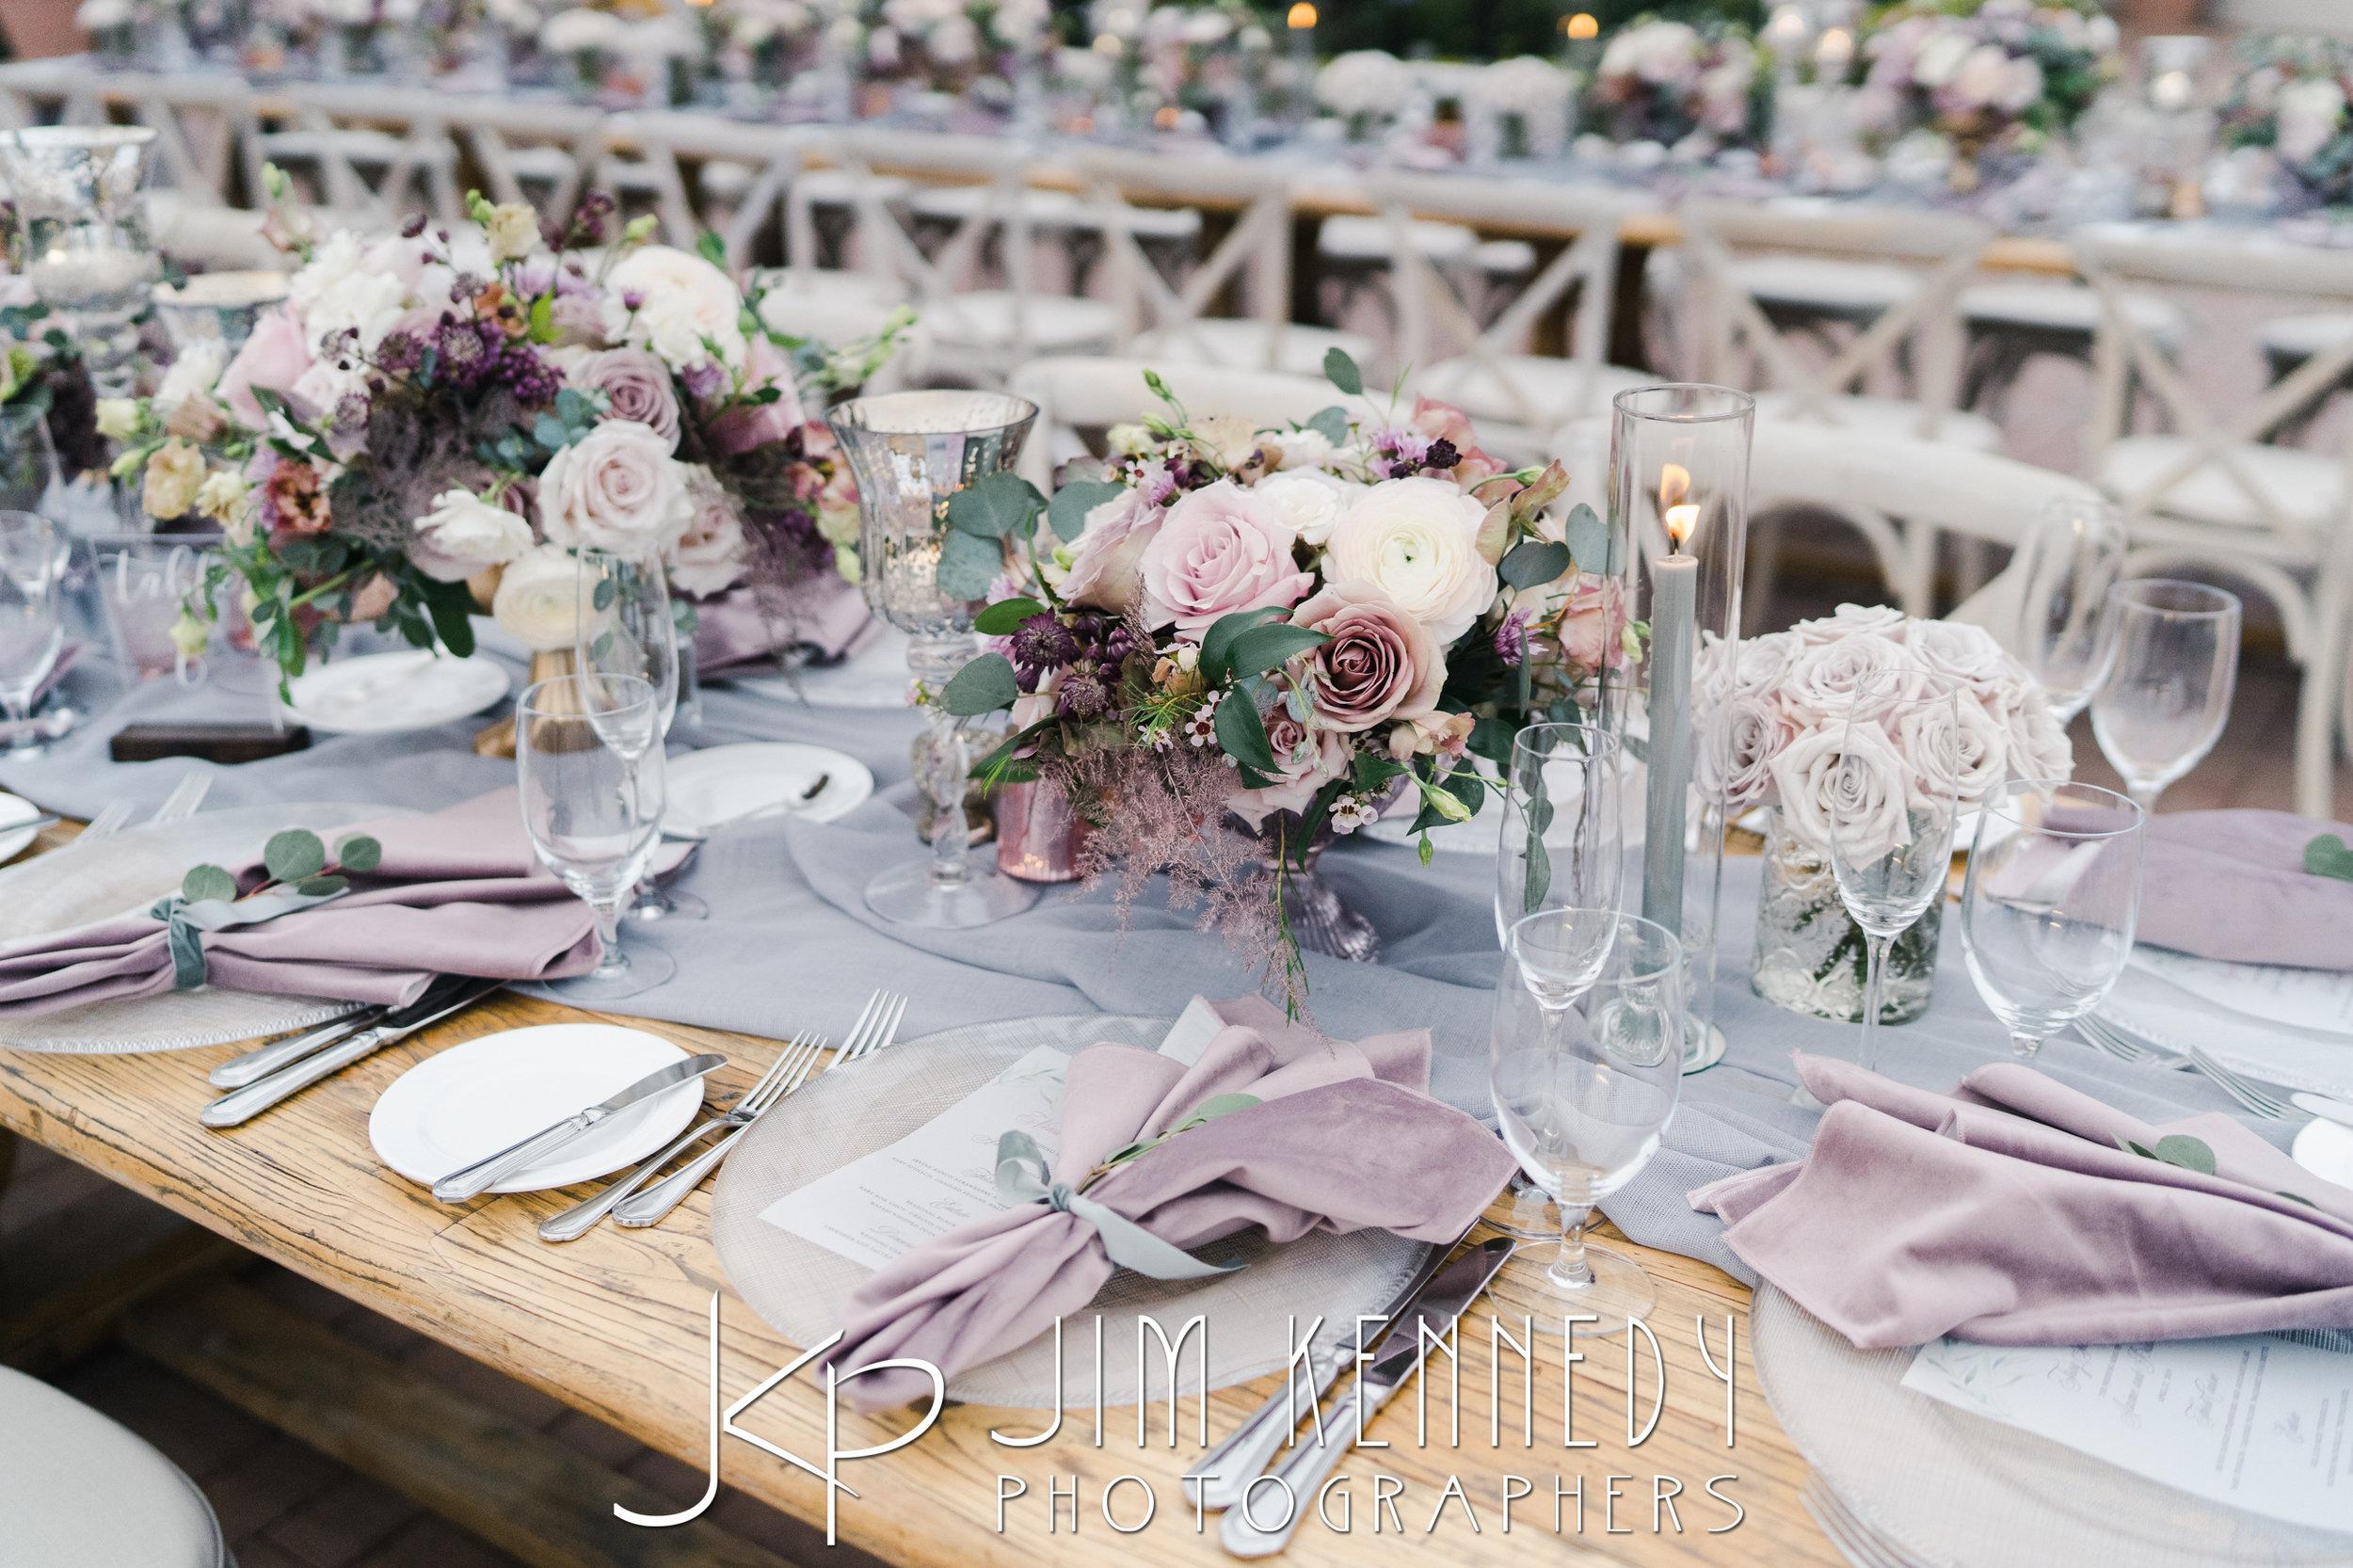 pelican-hill-wedding-jim-kenedy-photographers_0194.JPG